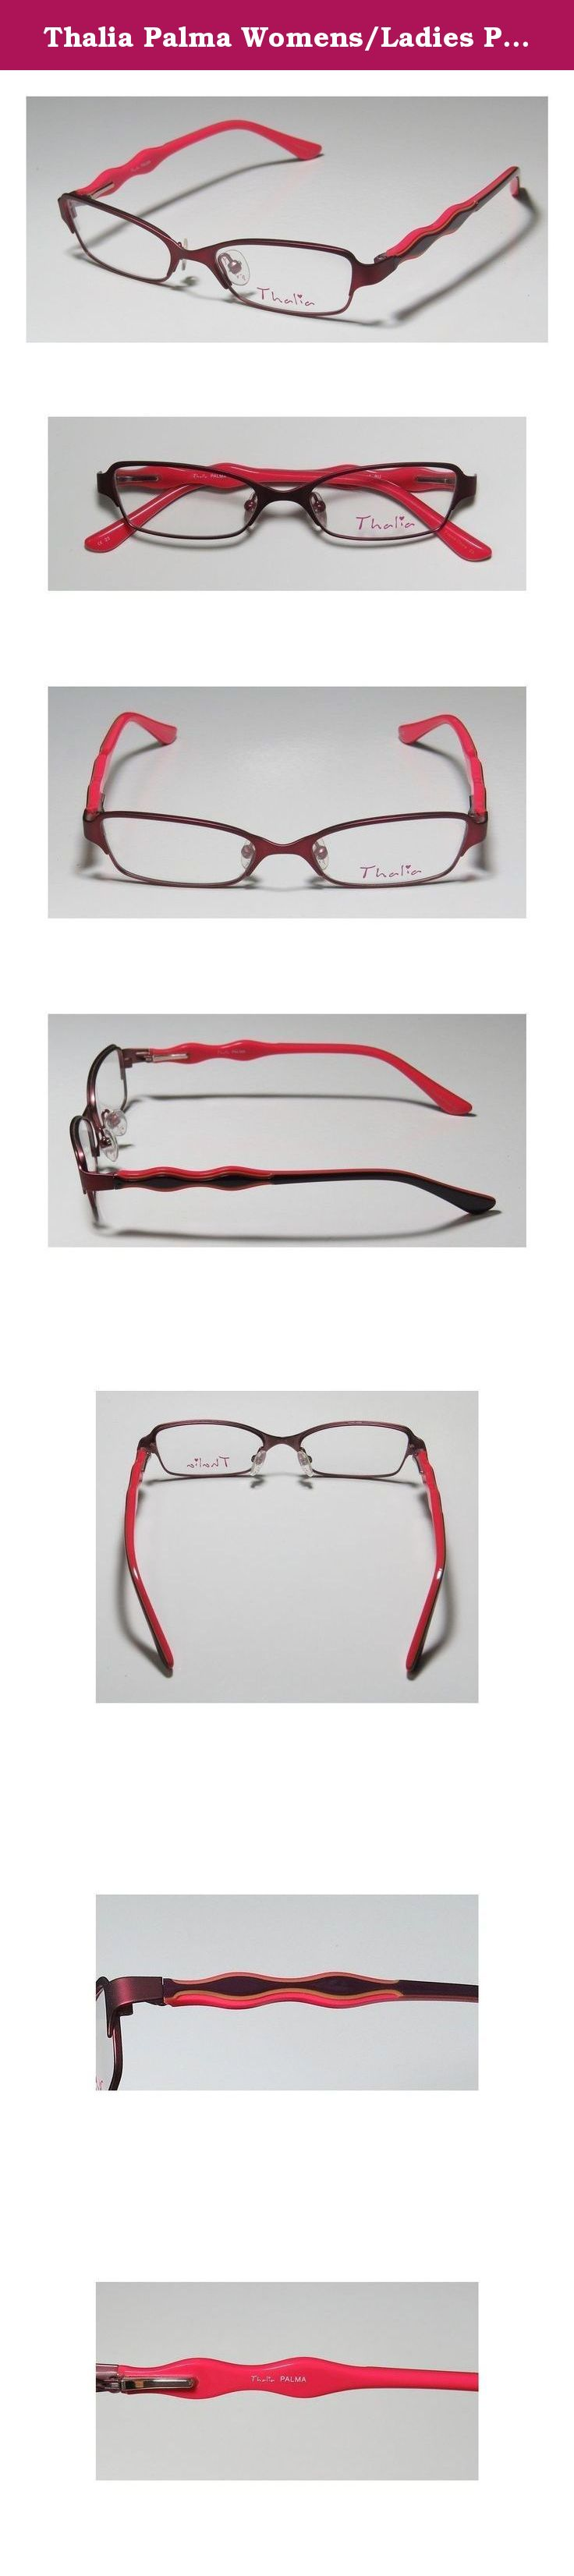 ba49f91b862 Thalia Palma Womens Ladies Prescription Ready Glamorous Designer Full-rim  Eyeglasses Glasses (